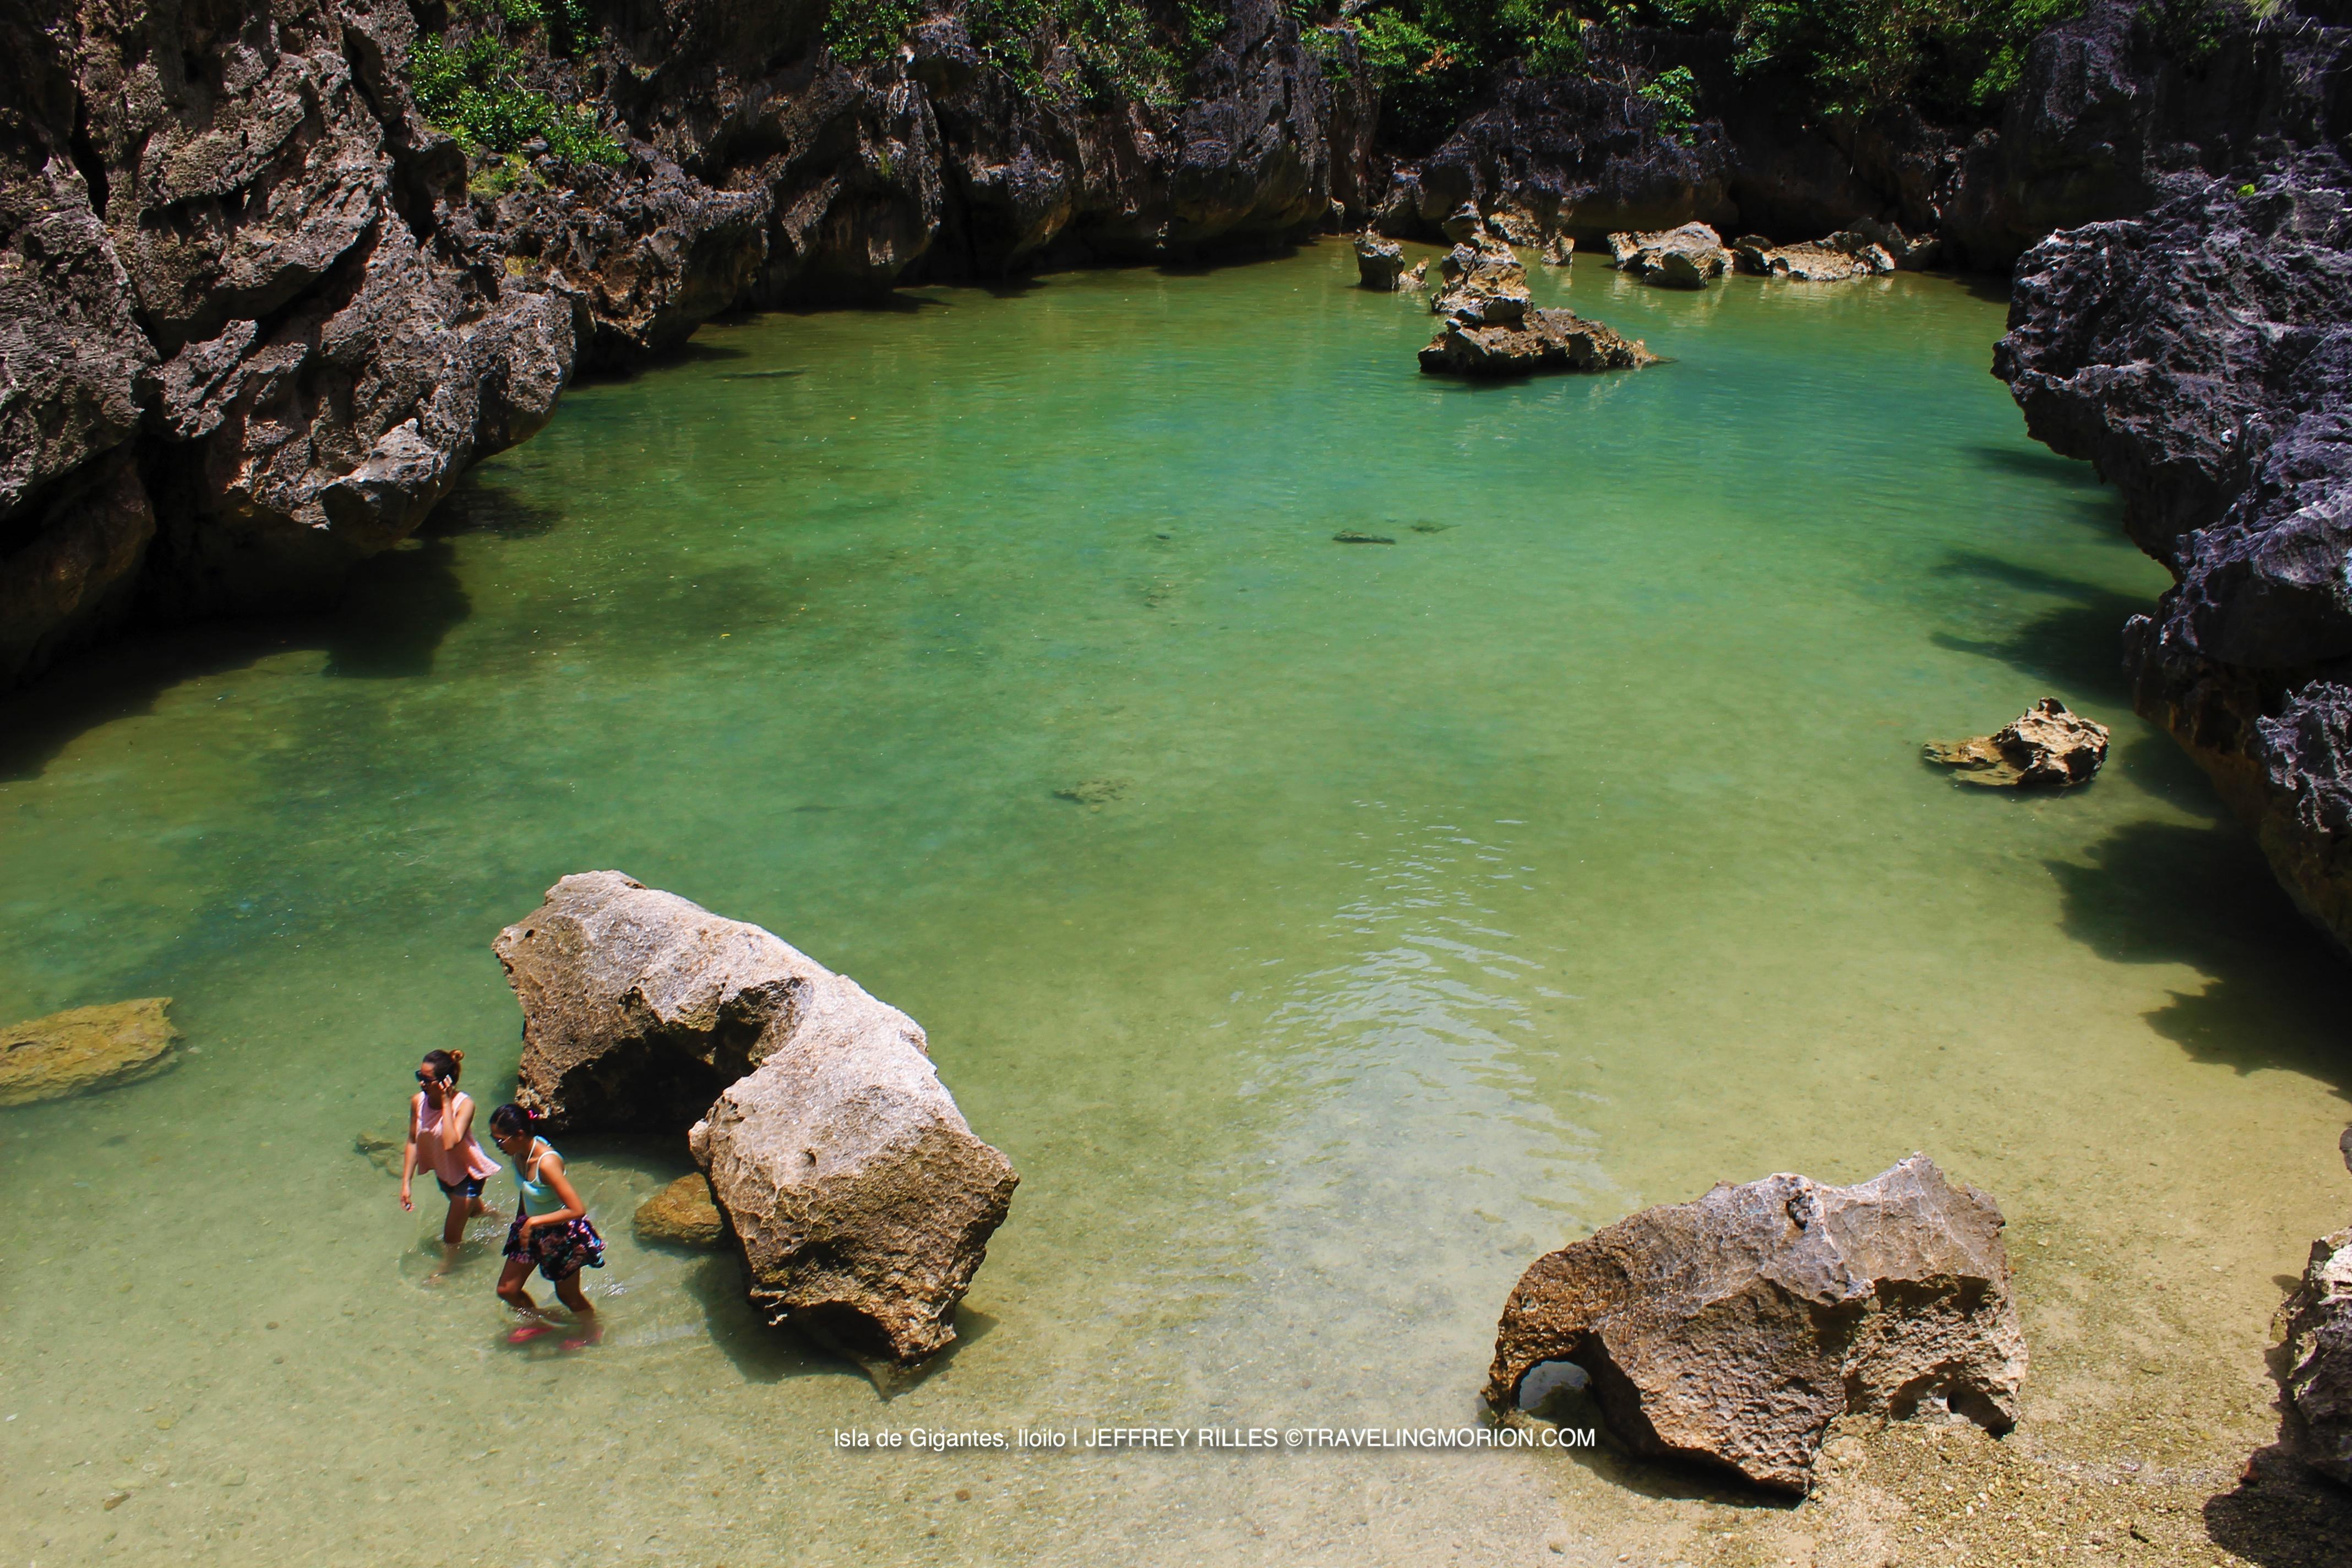 Tangke Salt Lagoon, Islas de Gigantes